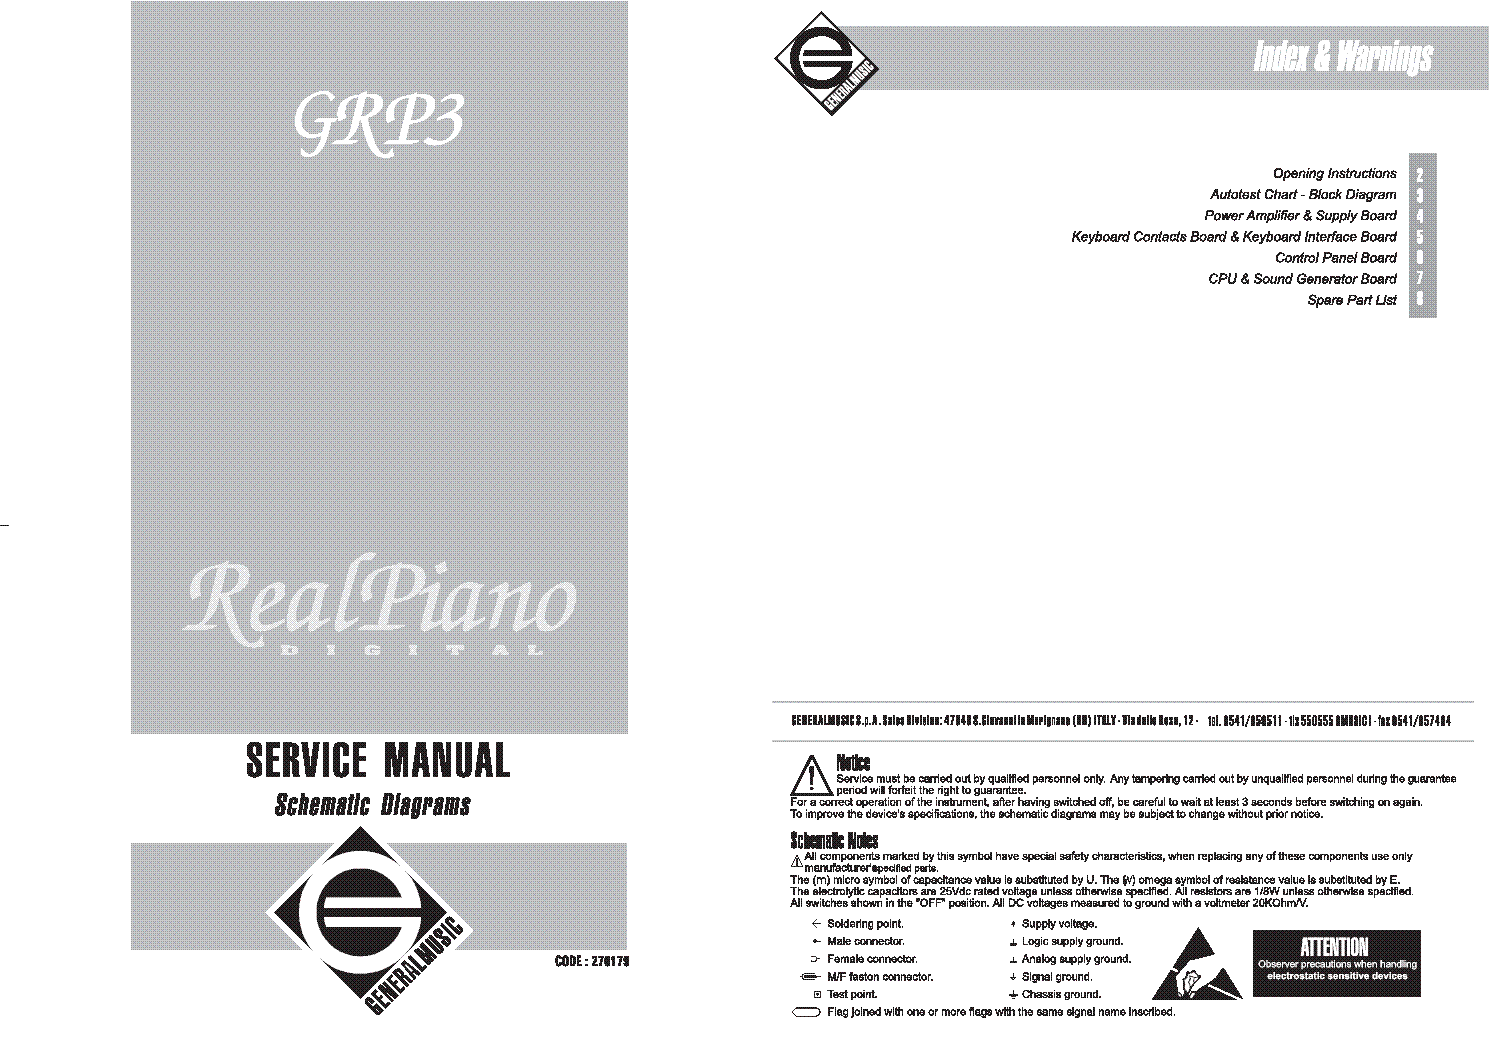 Generalmusic sk76 sk88 world keyboard service manual download generalmusic grp3 realpiano biocorpaavc Choice Image